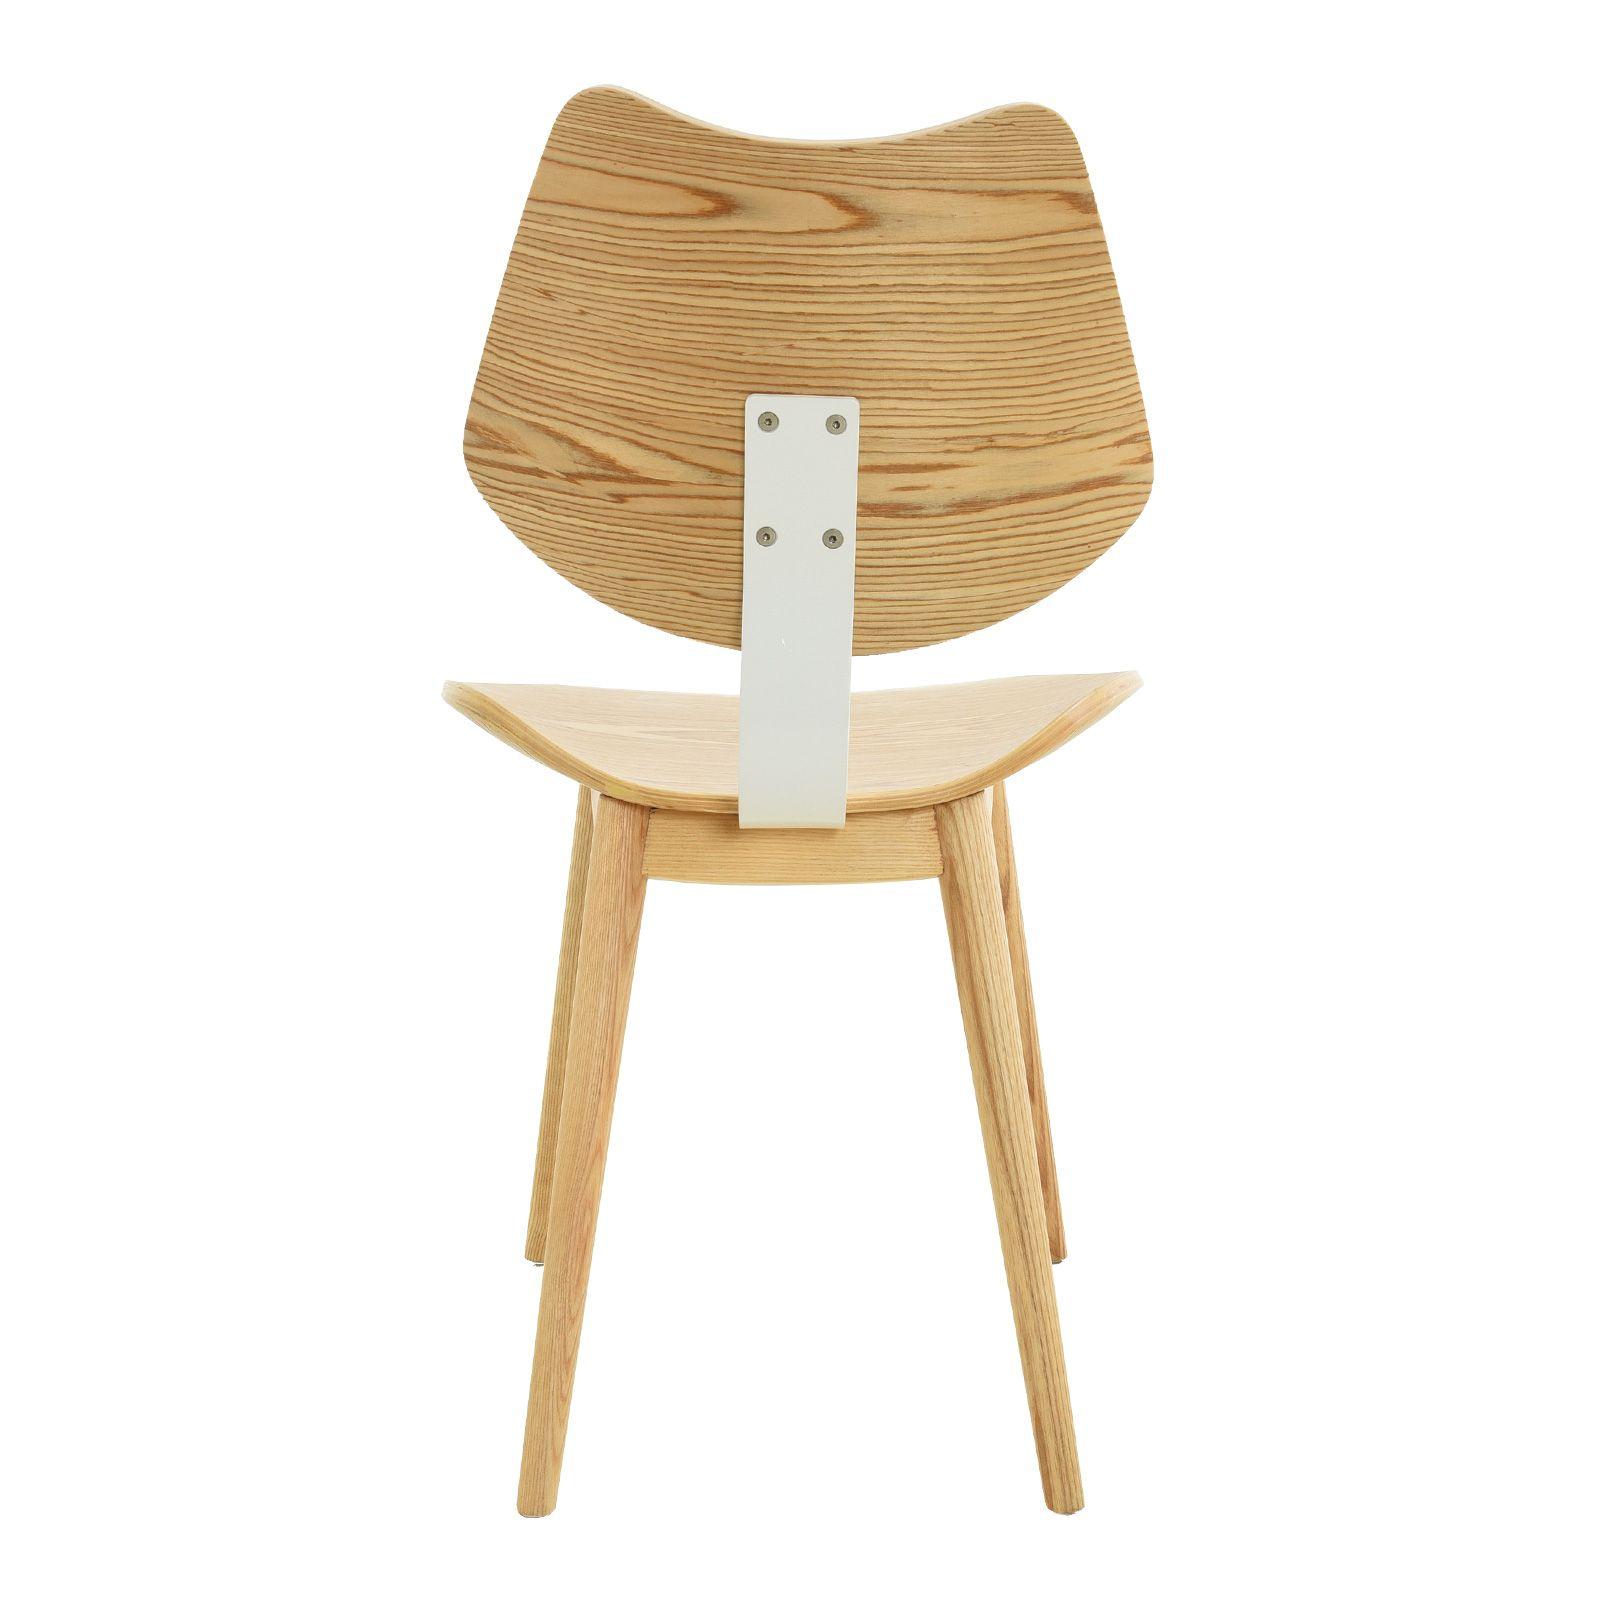 JAN | Silla de madera de fresno natural y estructura metálica (53 x 52,5 x 83,5 cm)